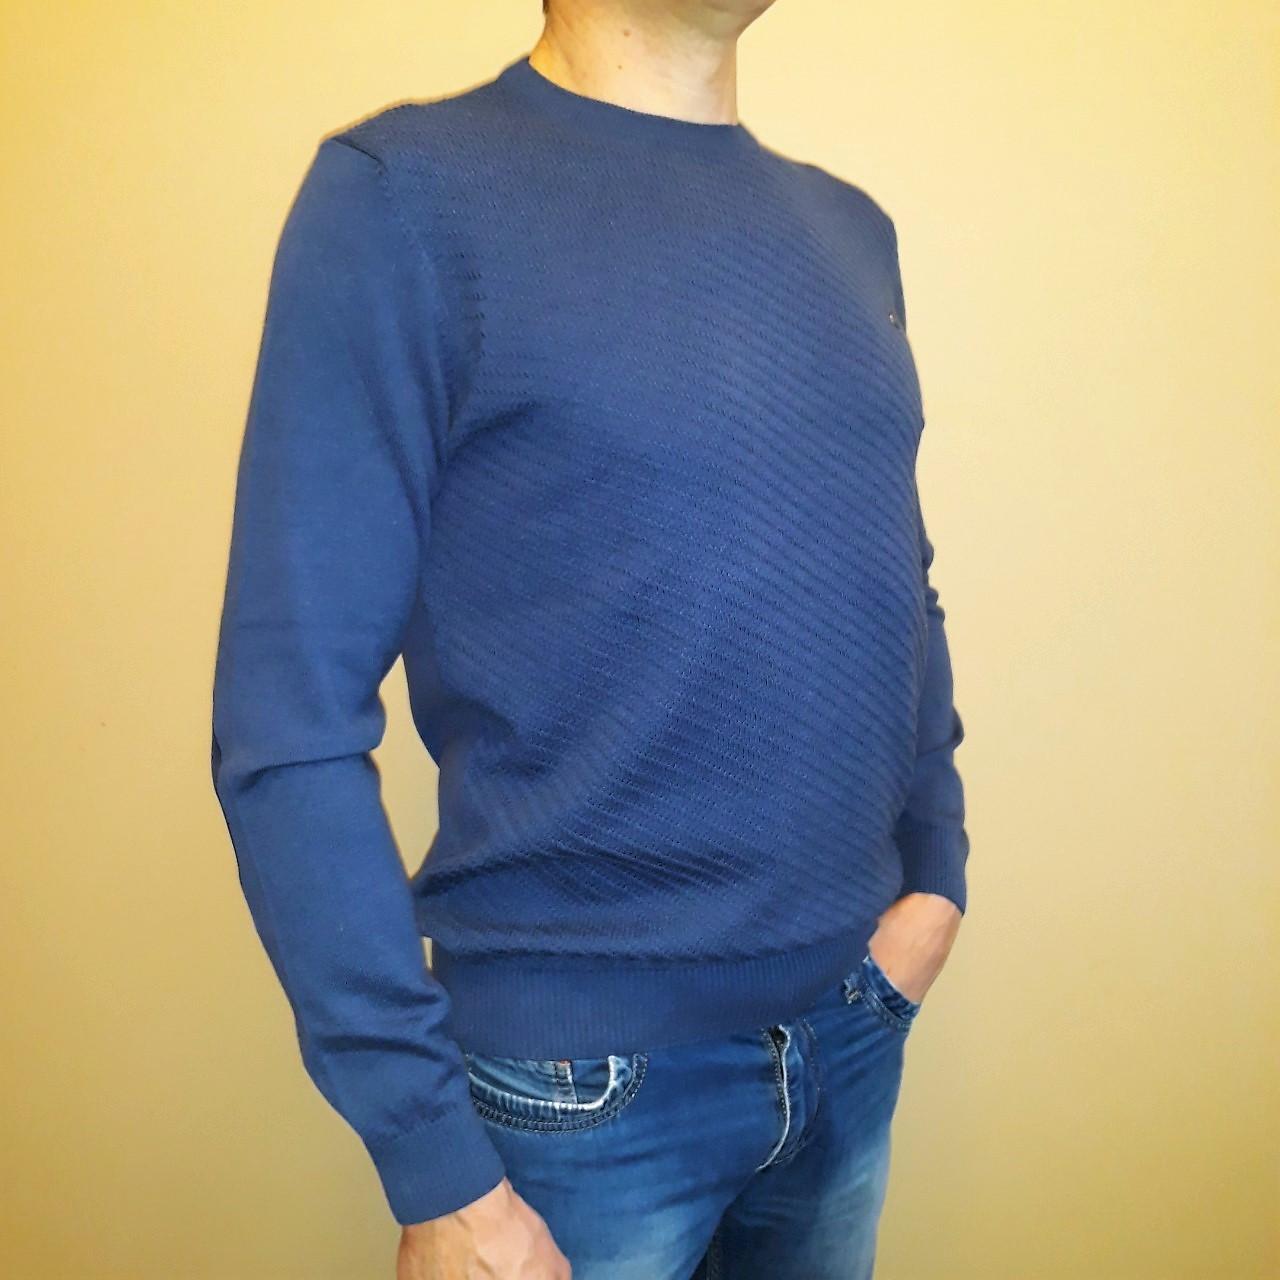 6c6a0254e03 Синий мужской джемпер Tony Montana (Турция)  продажа